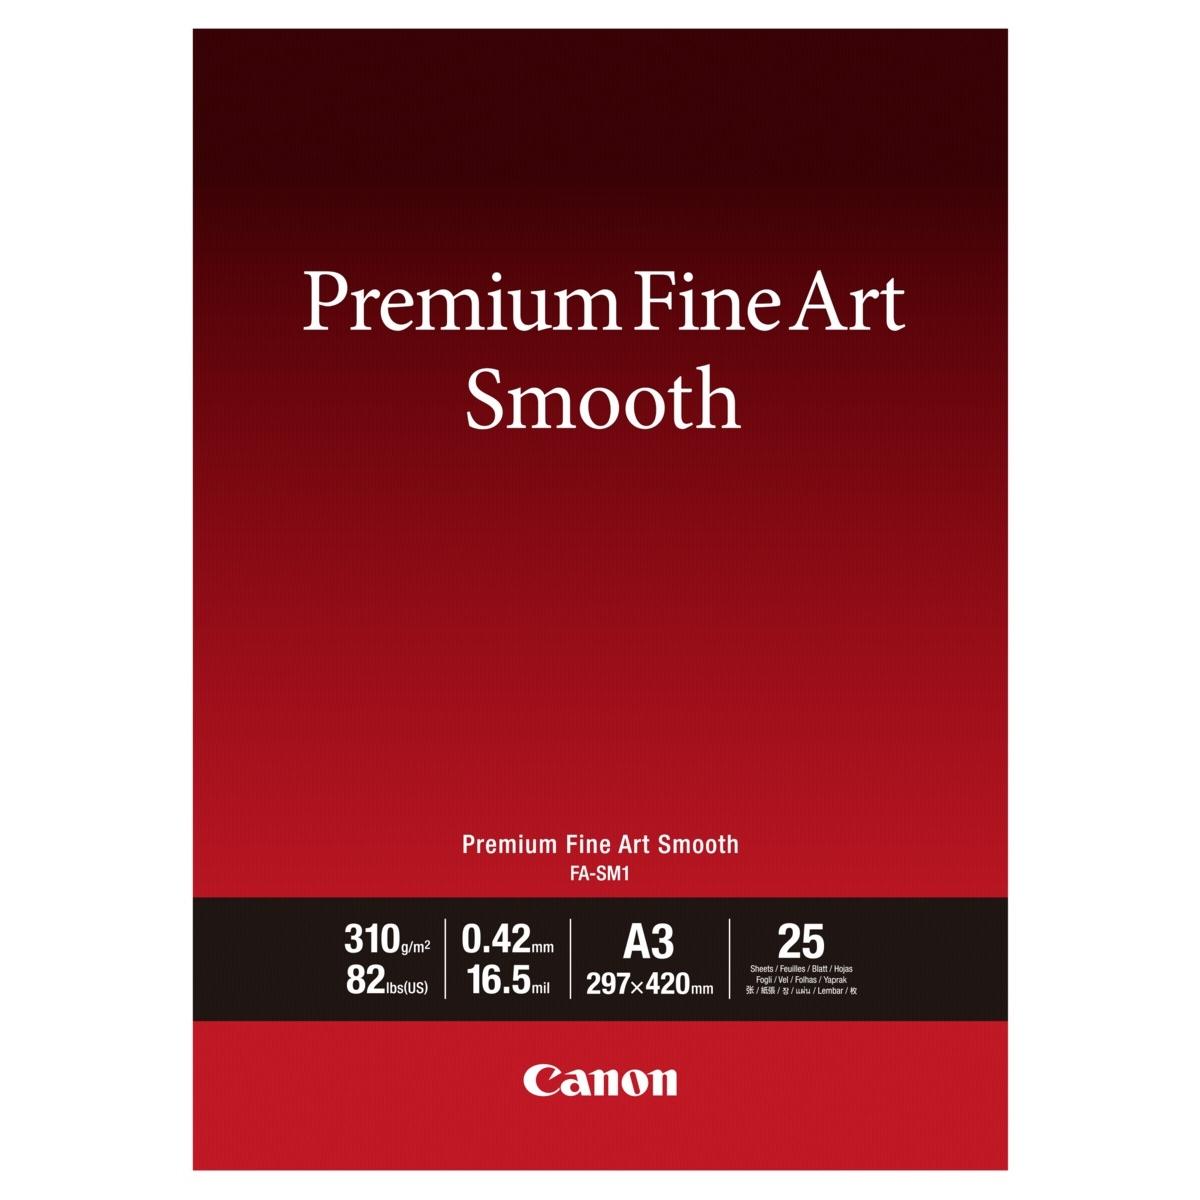 Original Canon FA-SM1 310gsm Premium Fine Art Smooth A3 Cotton Matte Photo Paper - 25 Sheets (1711C003)